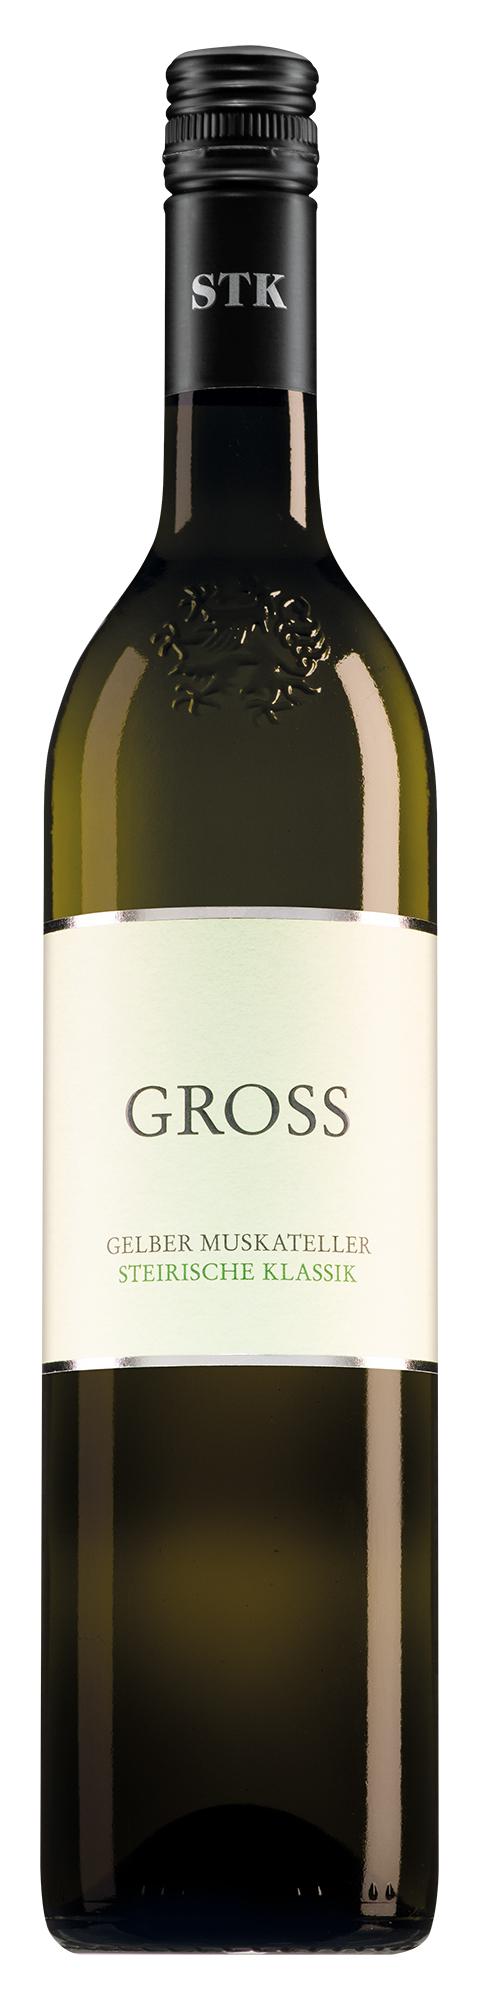 Weingut Gross Südsteiermark Gelber Muskateller